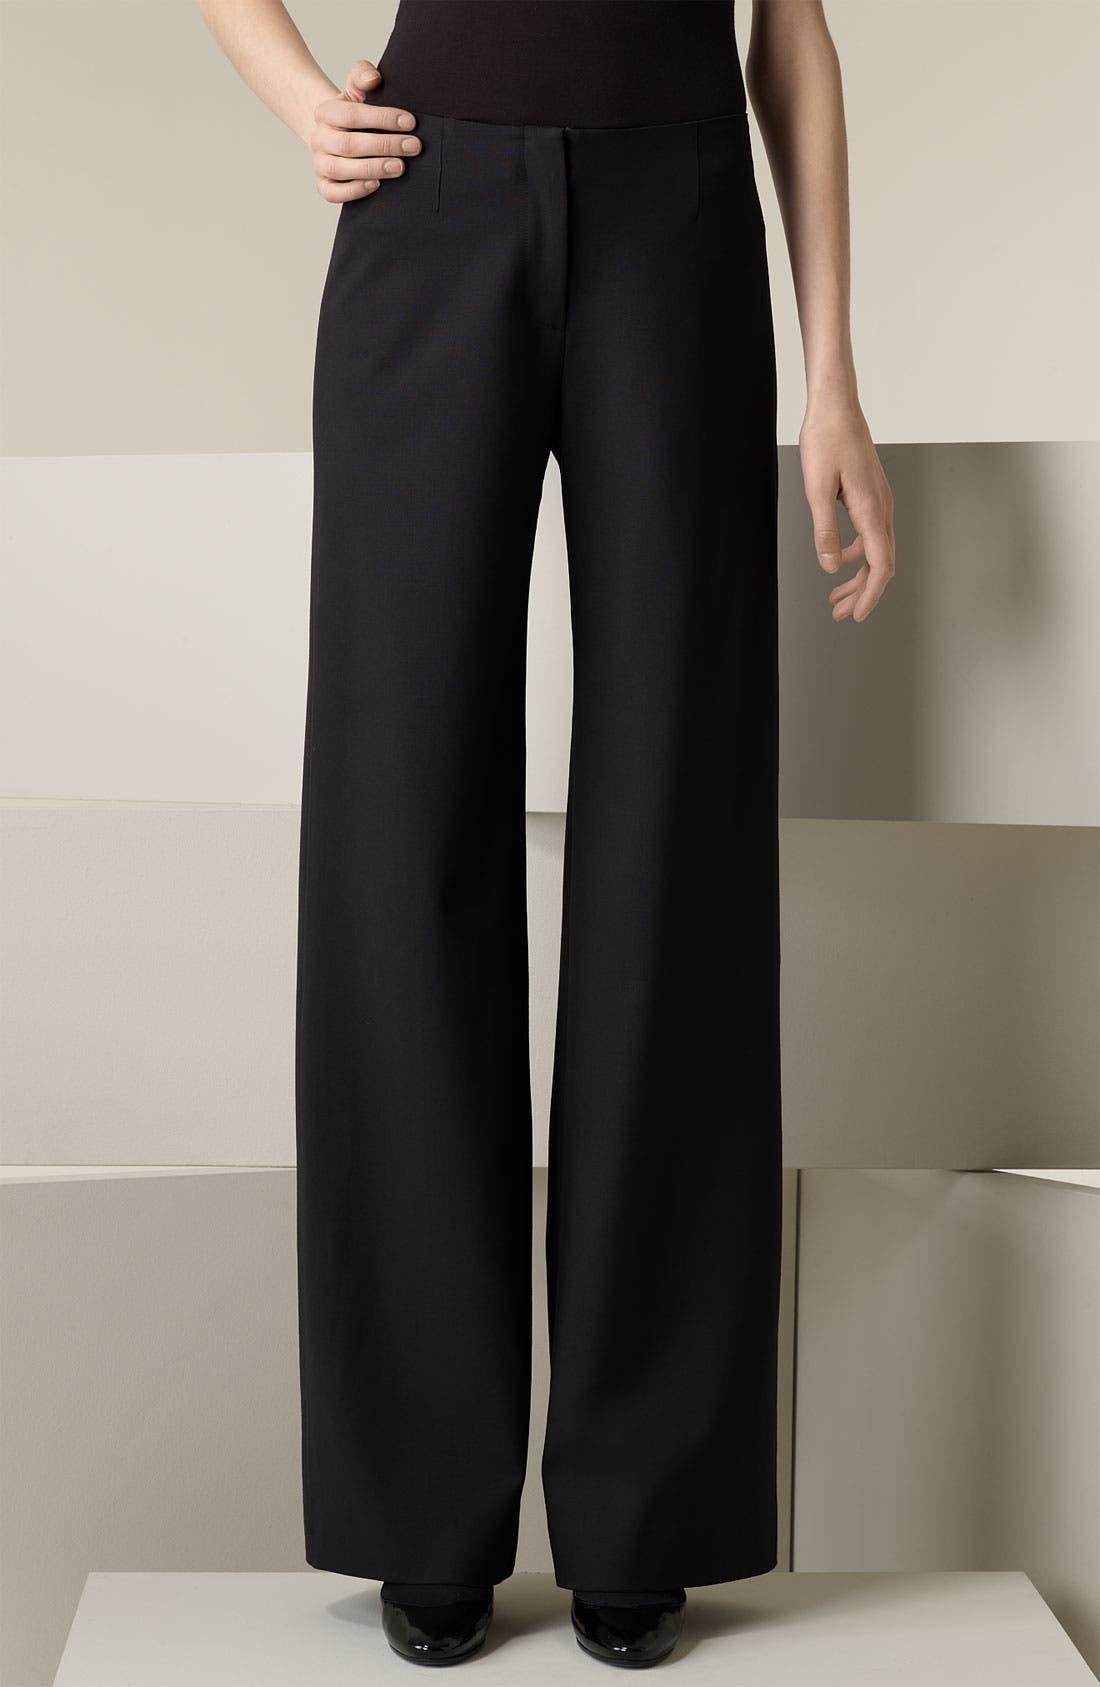 Alternate Image 1 Selected - Piazza Sempione 'Marilyn' Wide Leg Pants